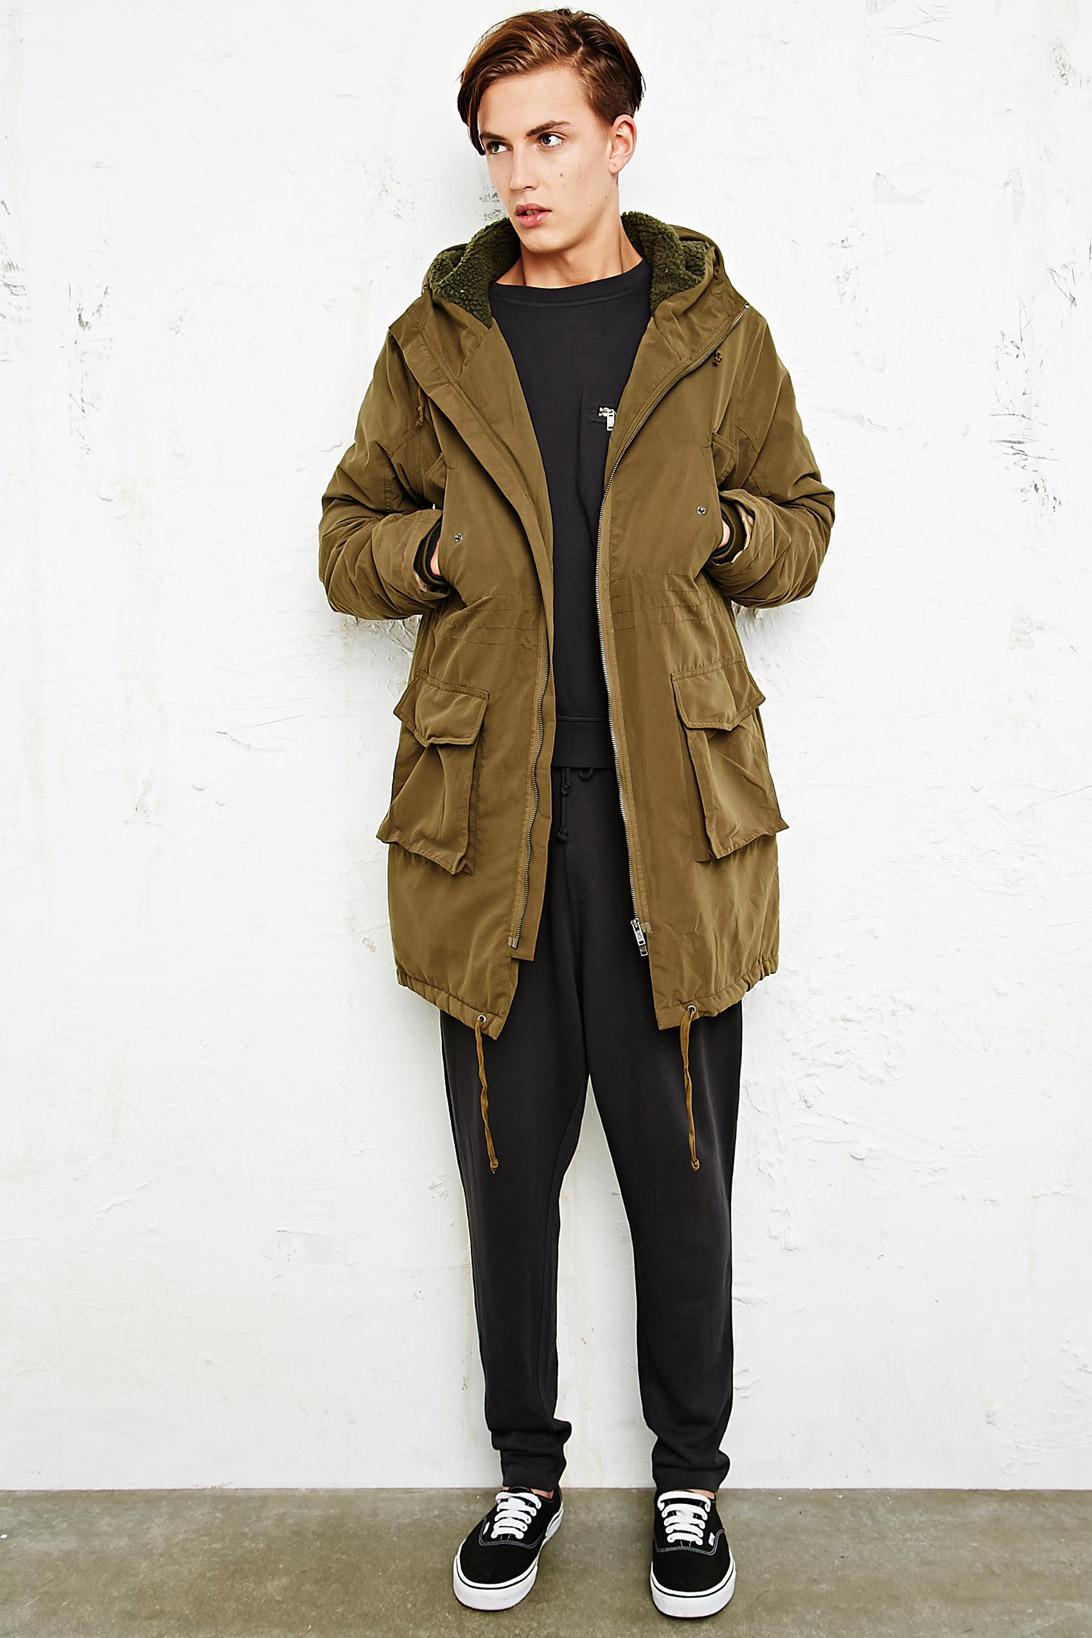 Parka Jacket Cheap